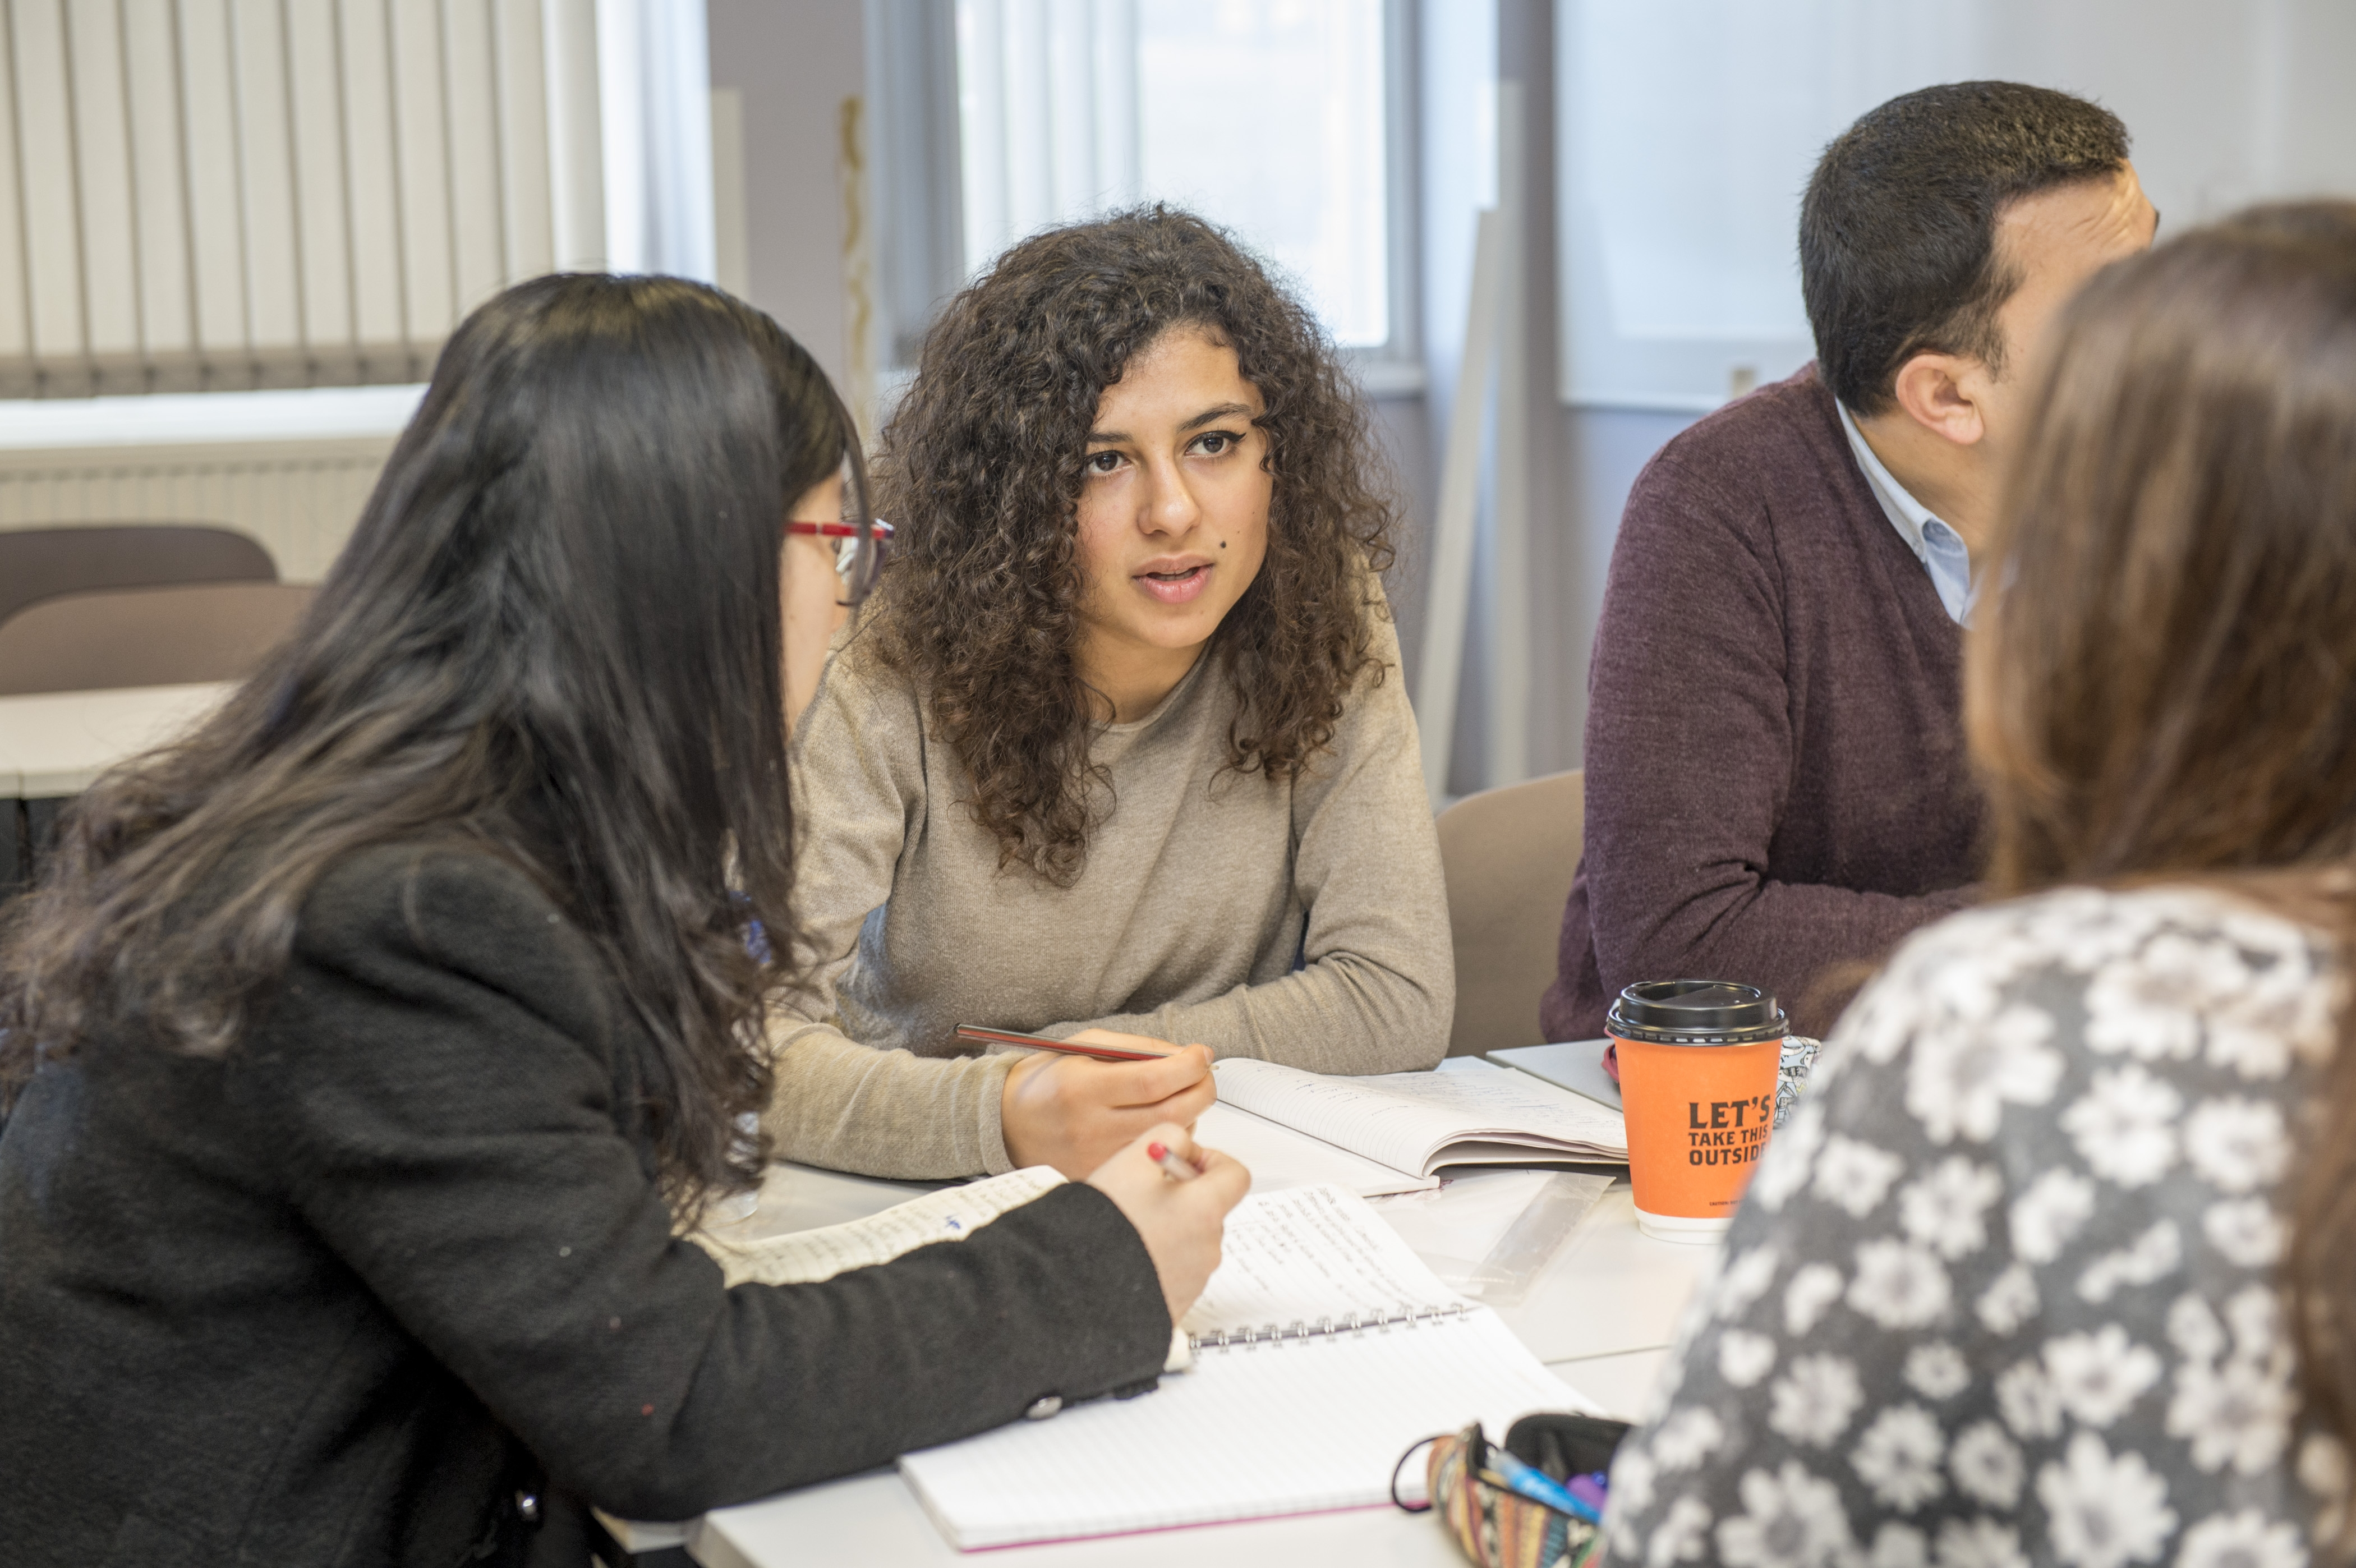 Students talking at a conversation club.